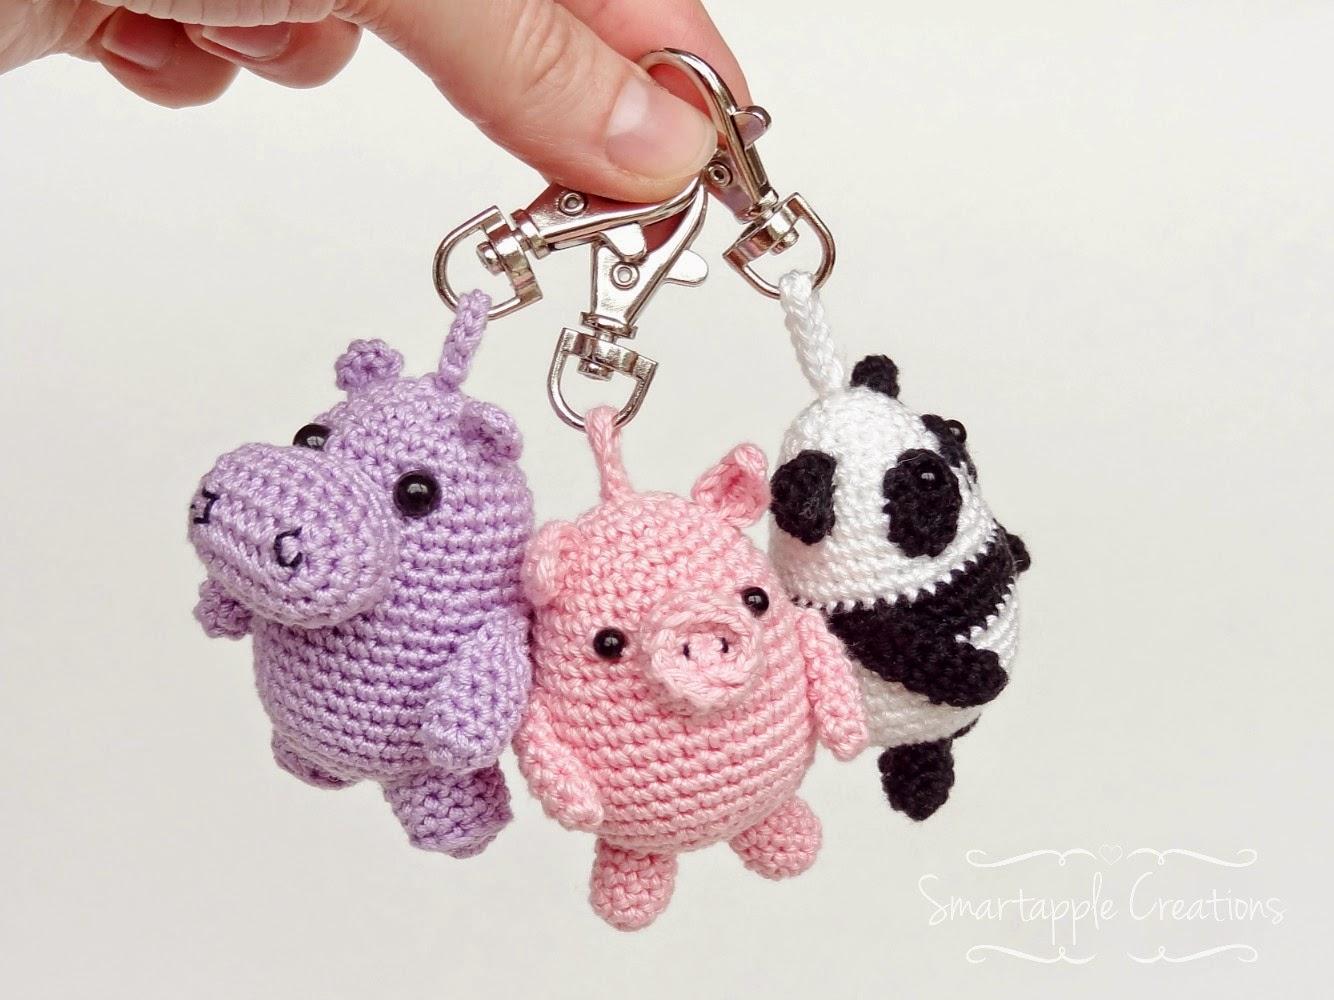 Amigurumi Keyring Pattern : Smartapple Creations - amigurumi and crochet: Amigurumi ...